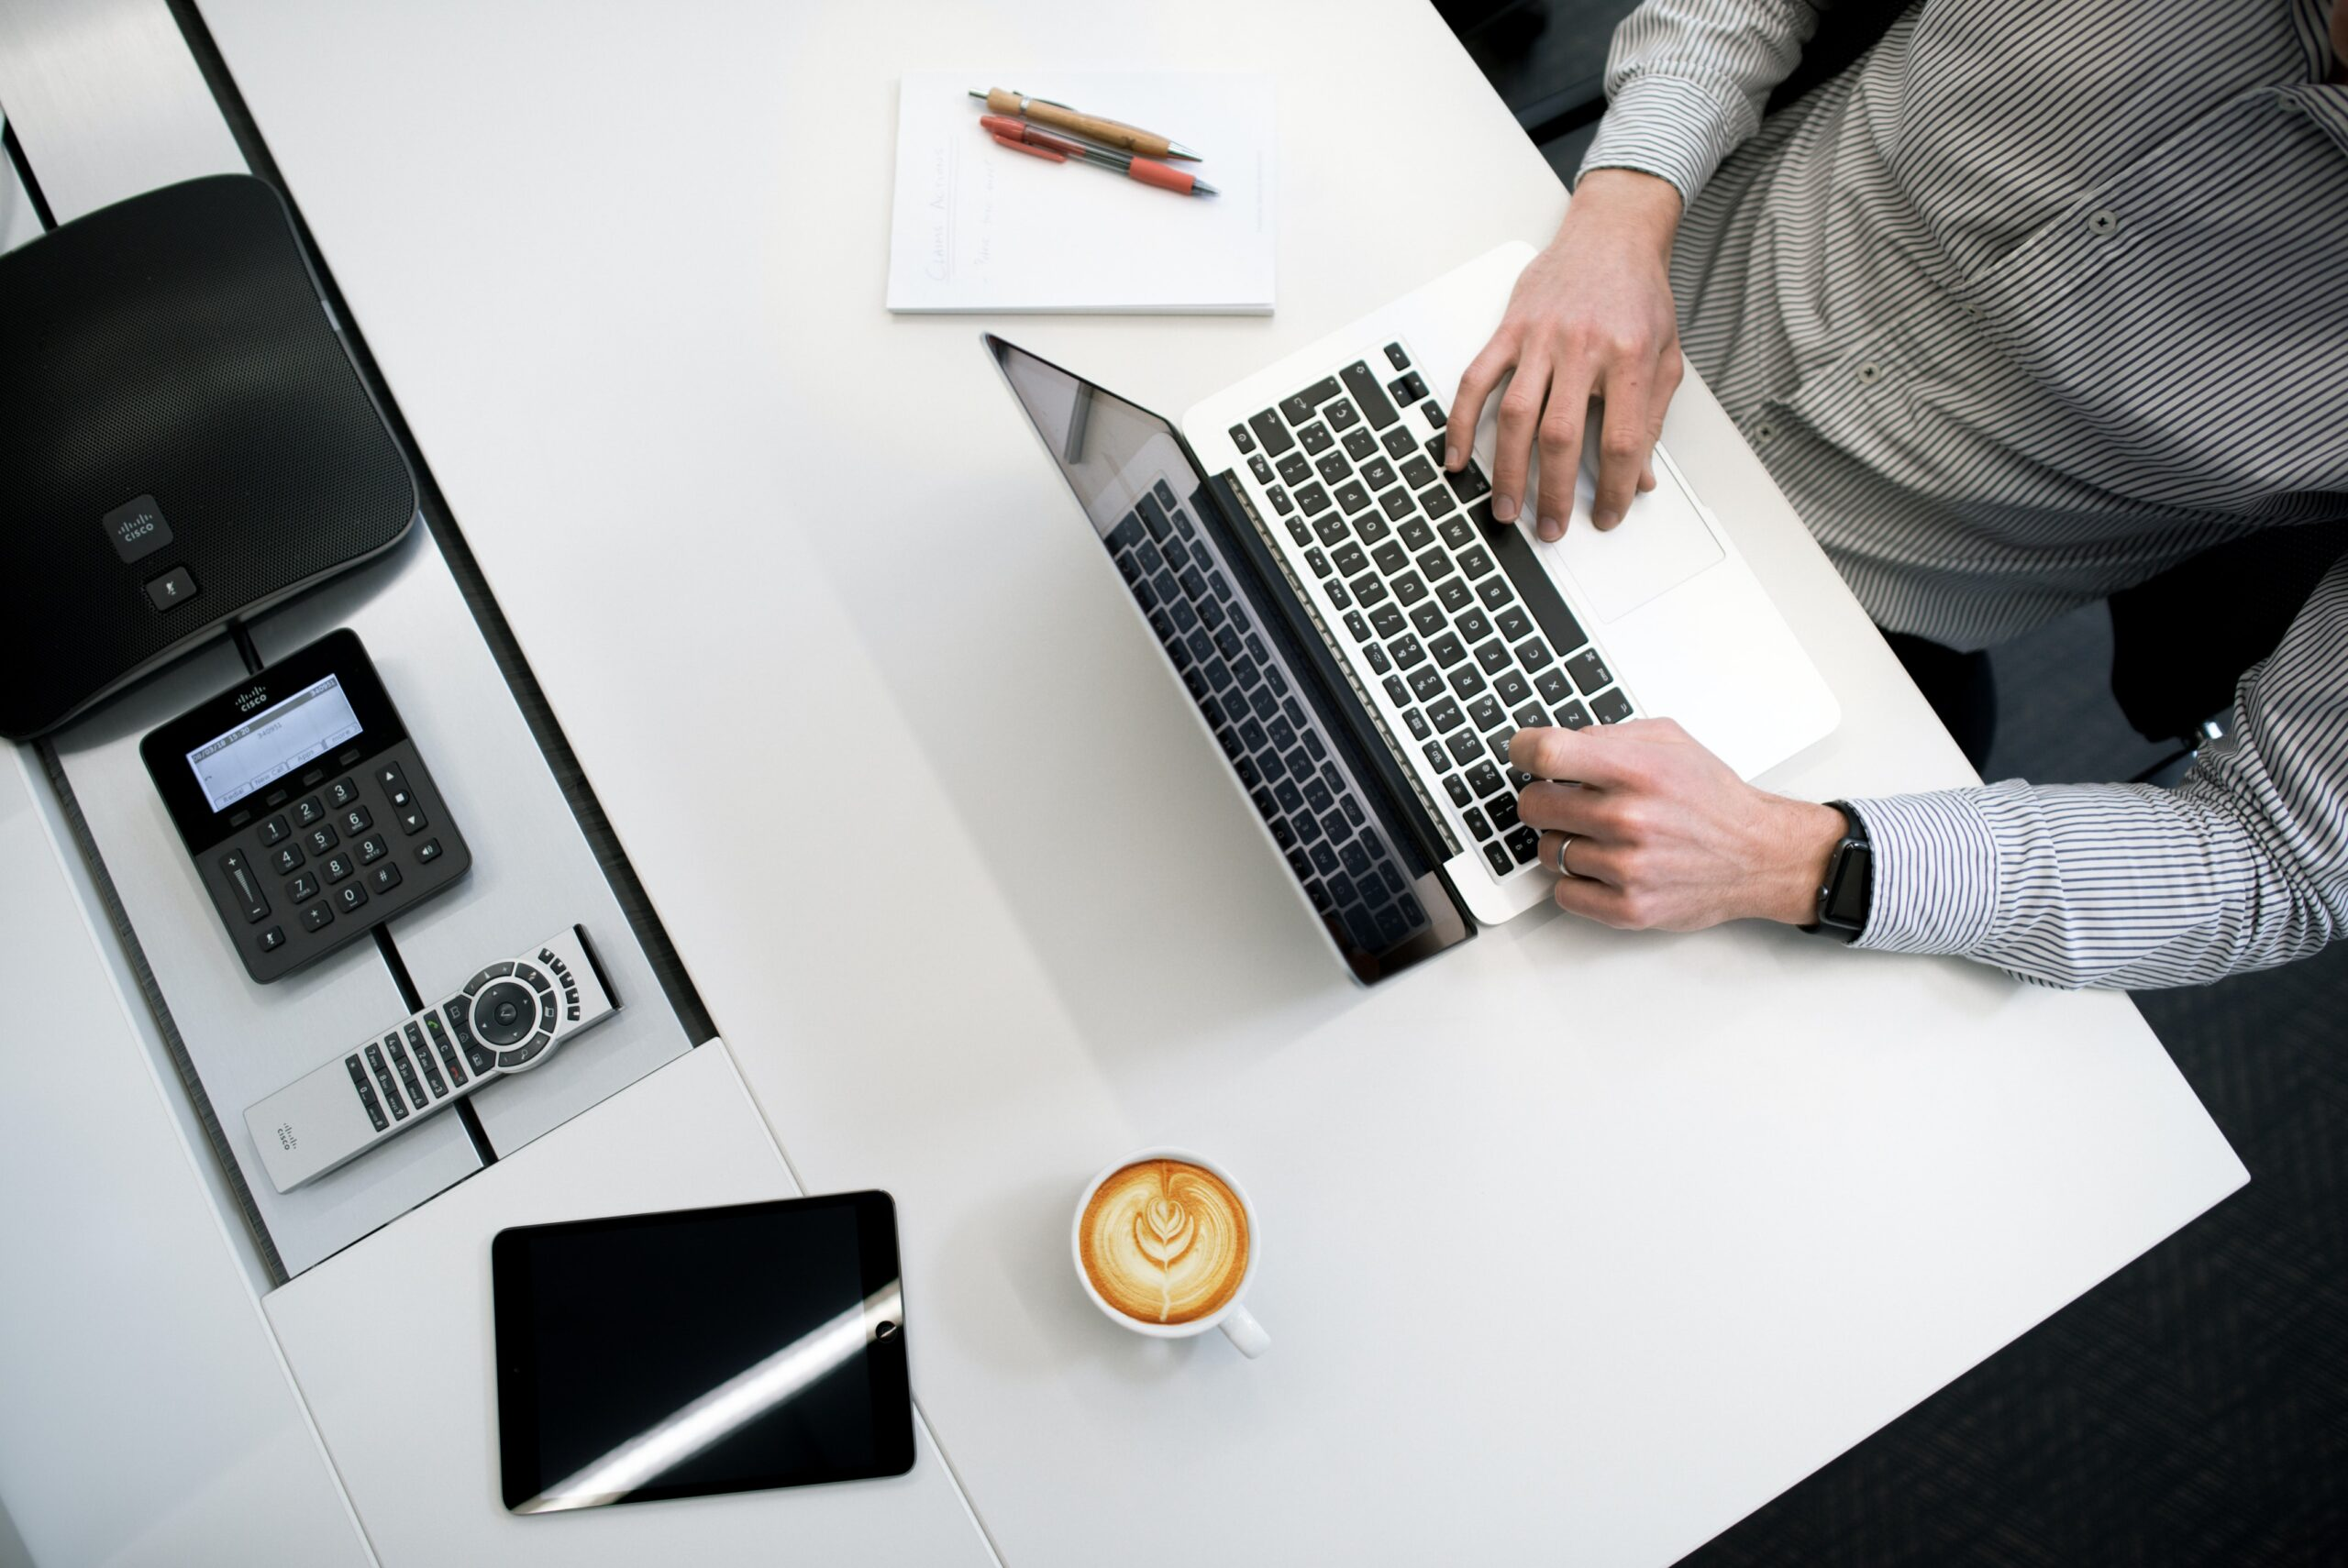 technology Equipment financing on a laptop